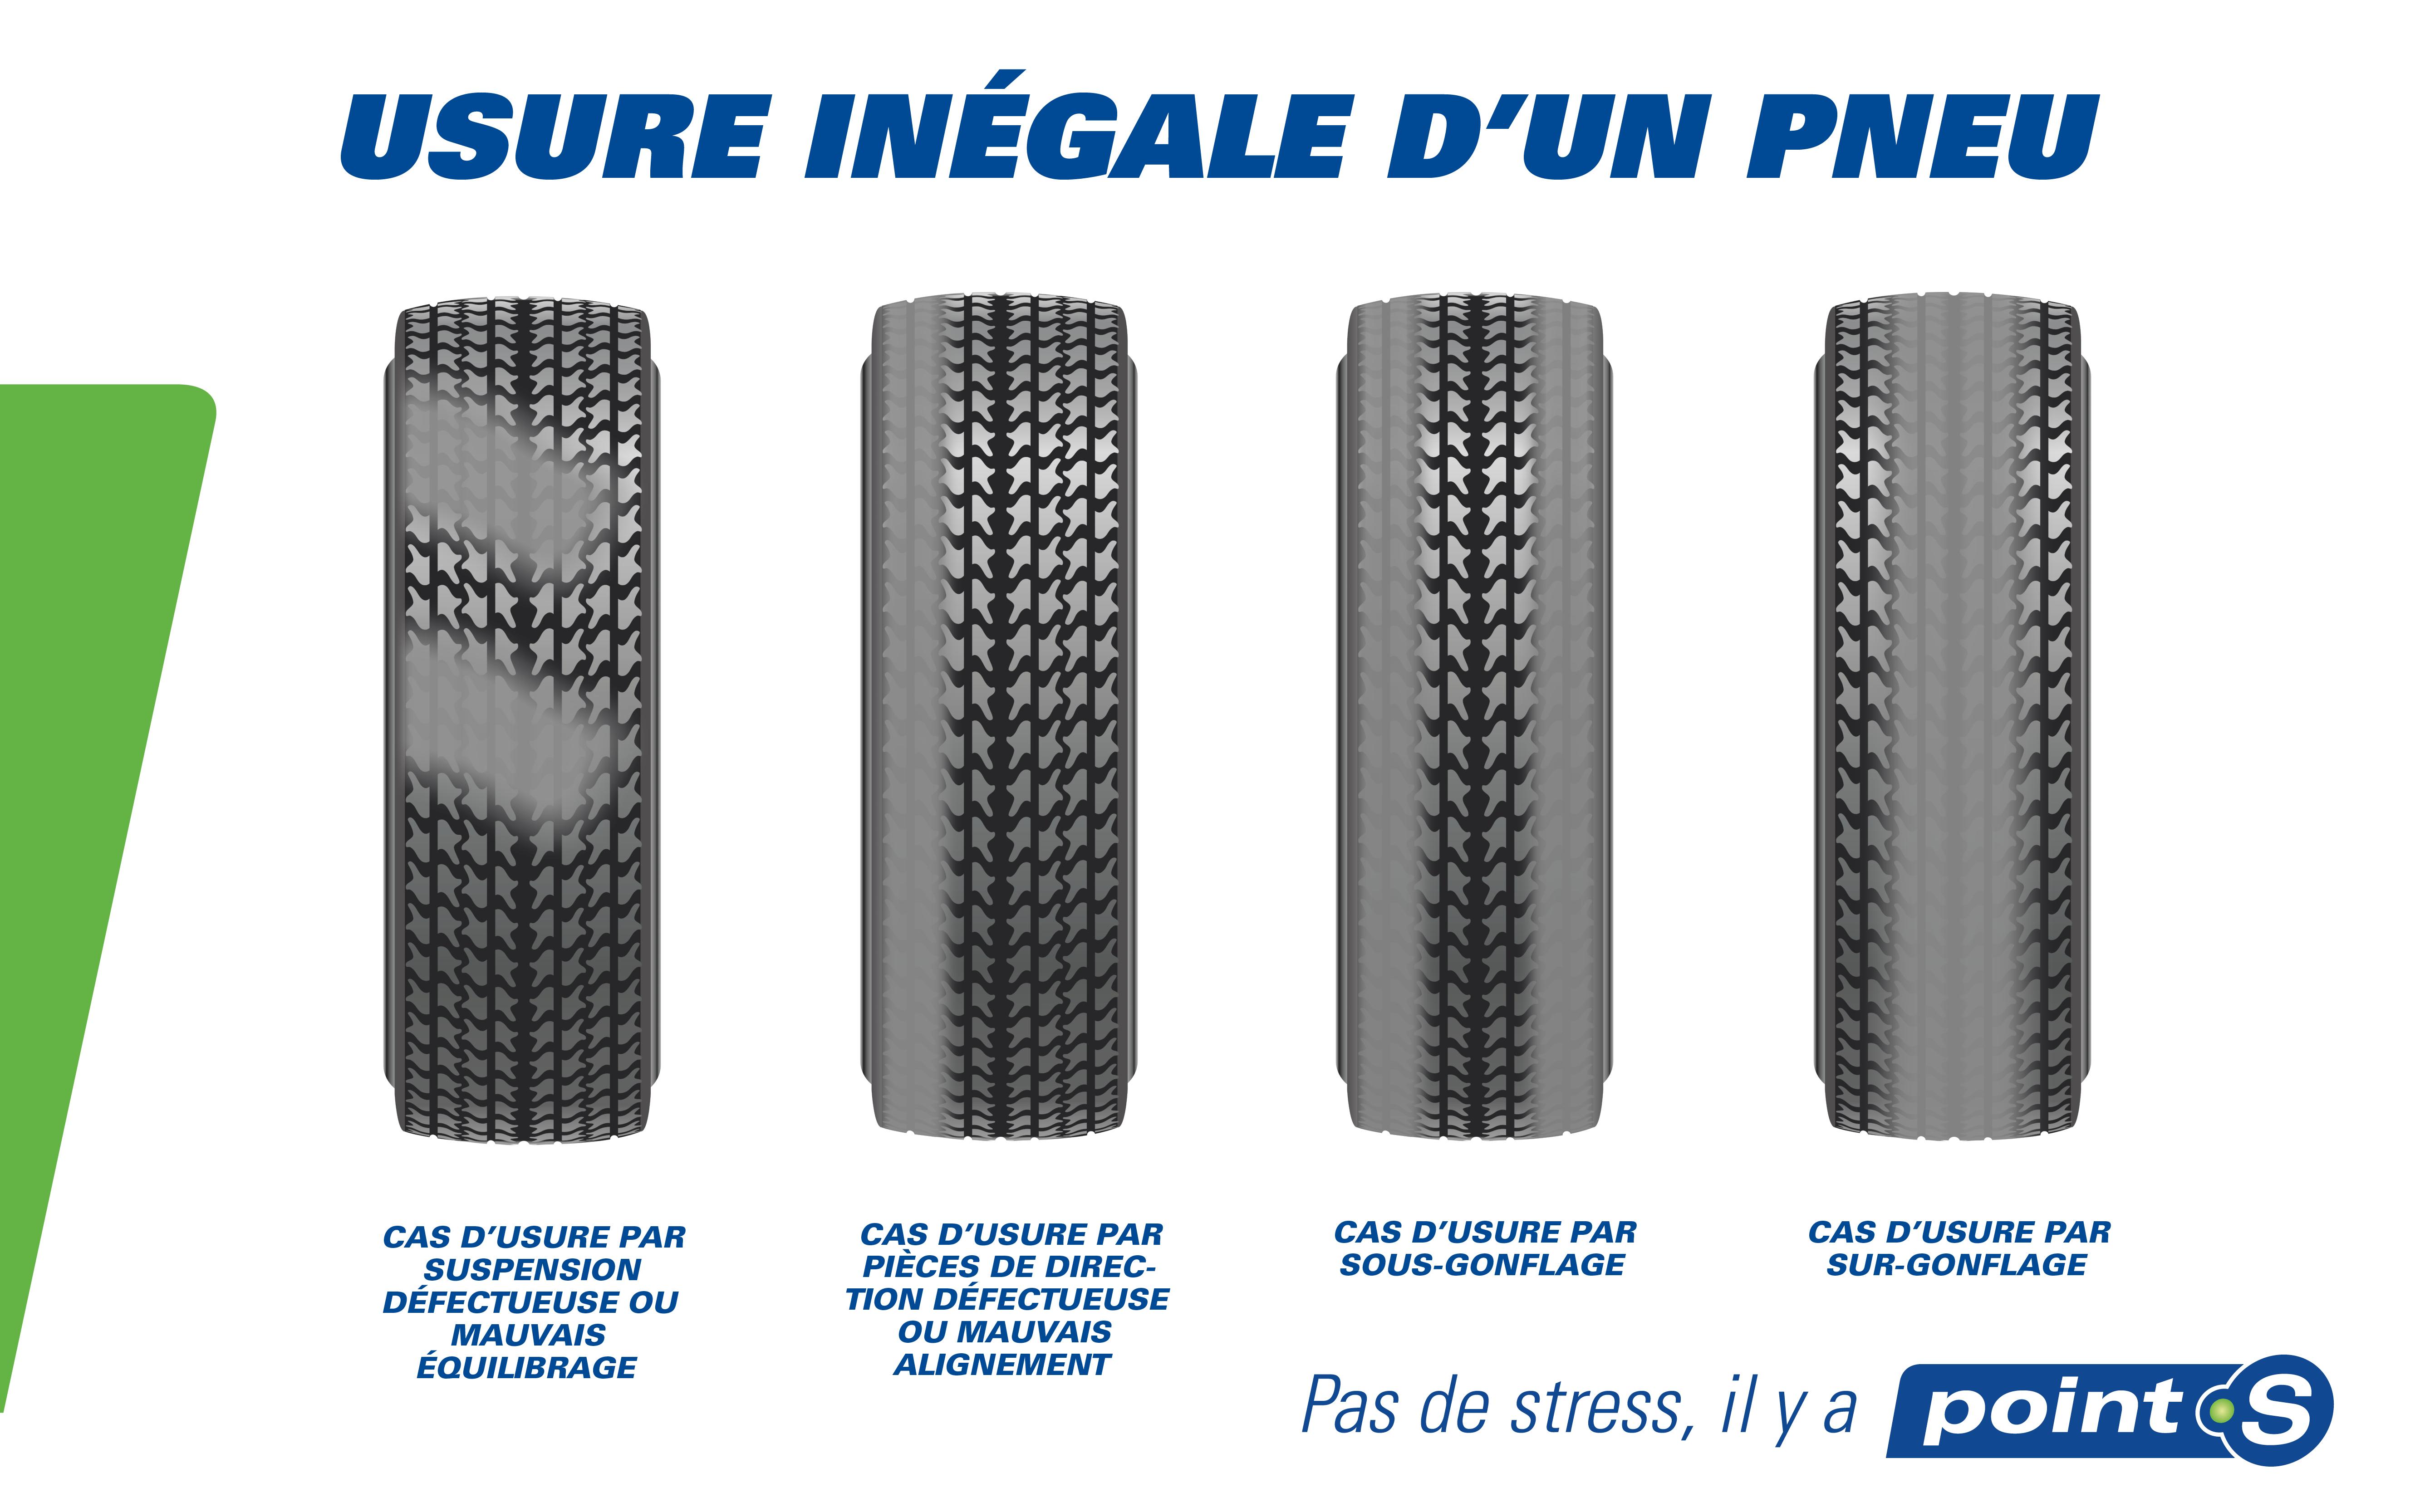 Usure pneu point s